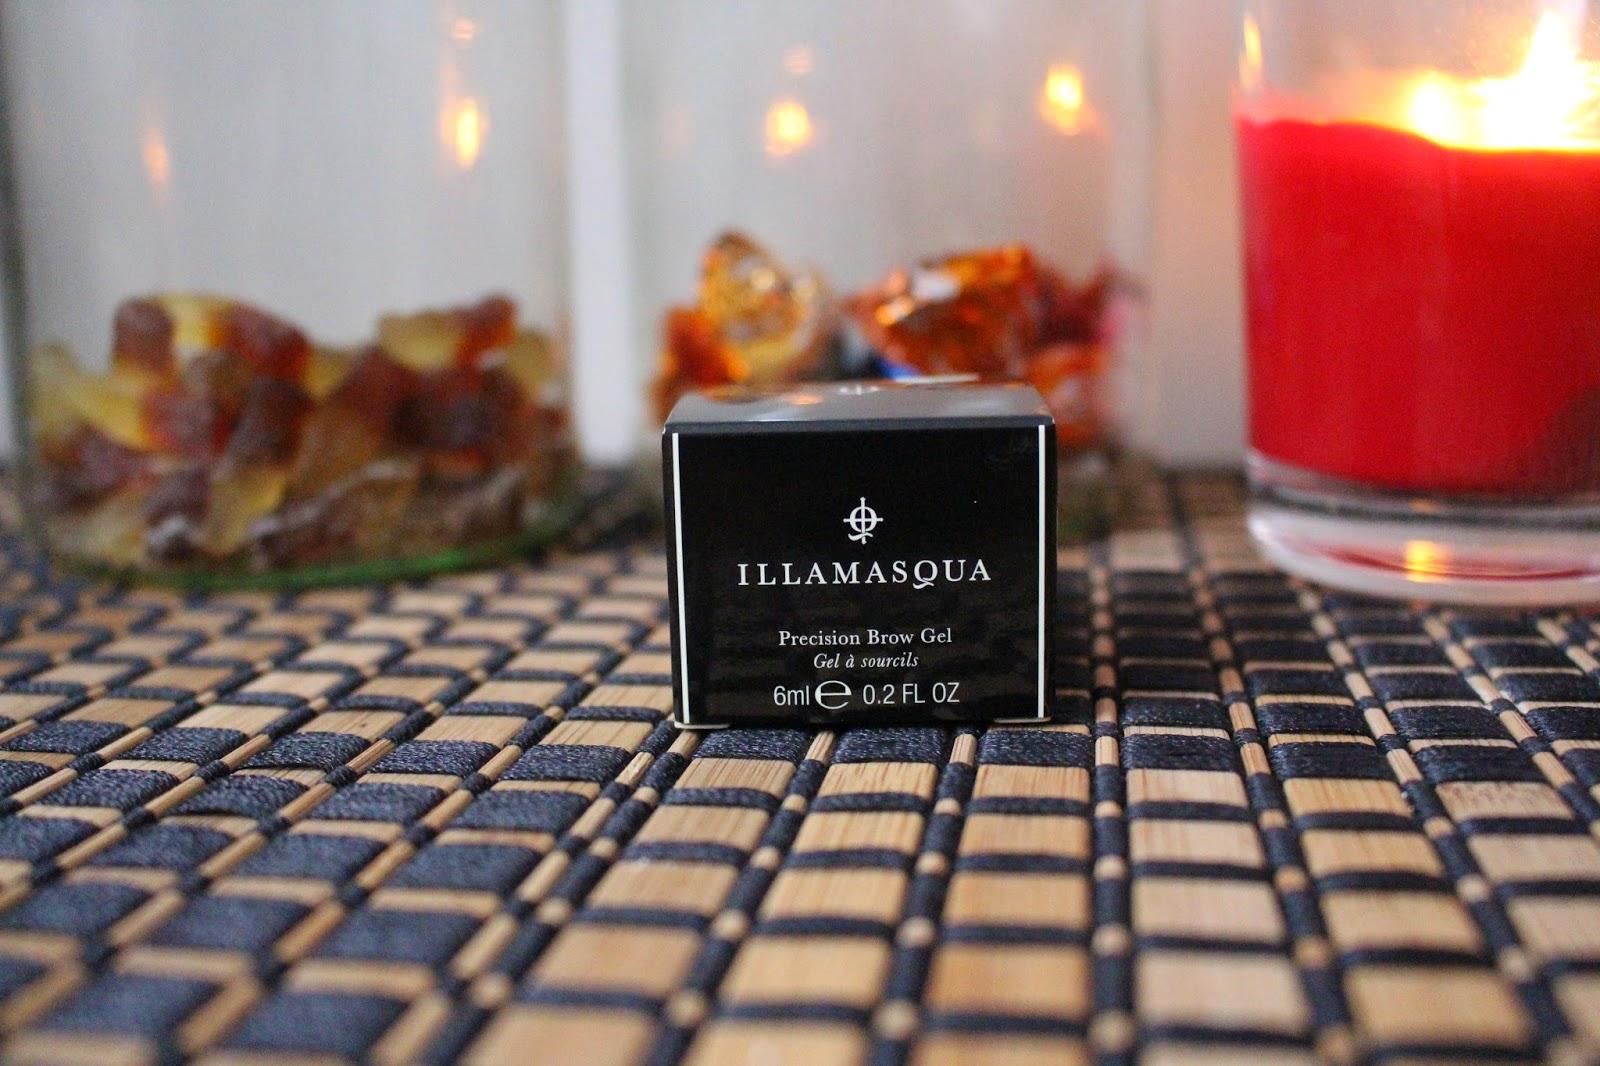 Illamasqua precision brow gel review